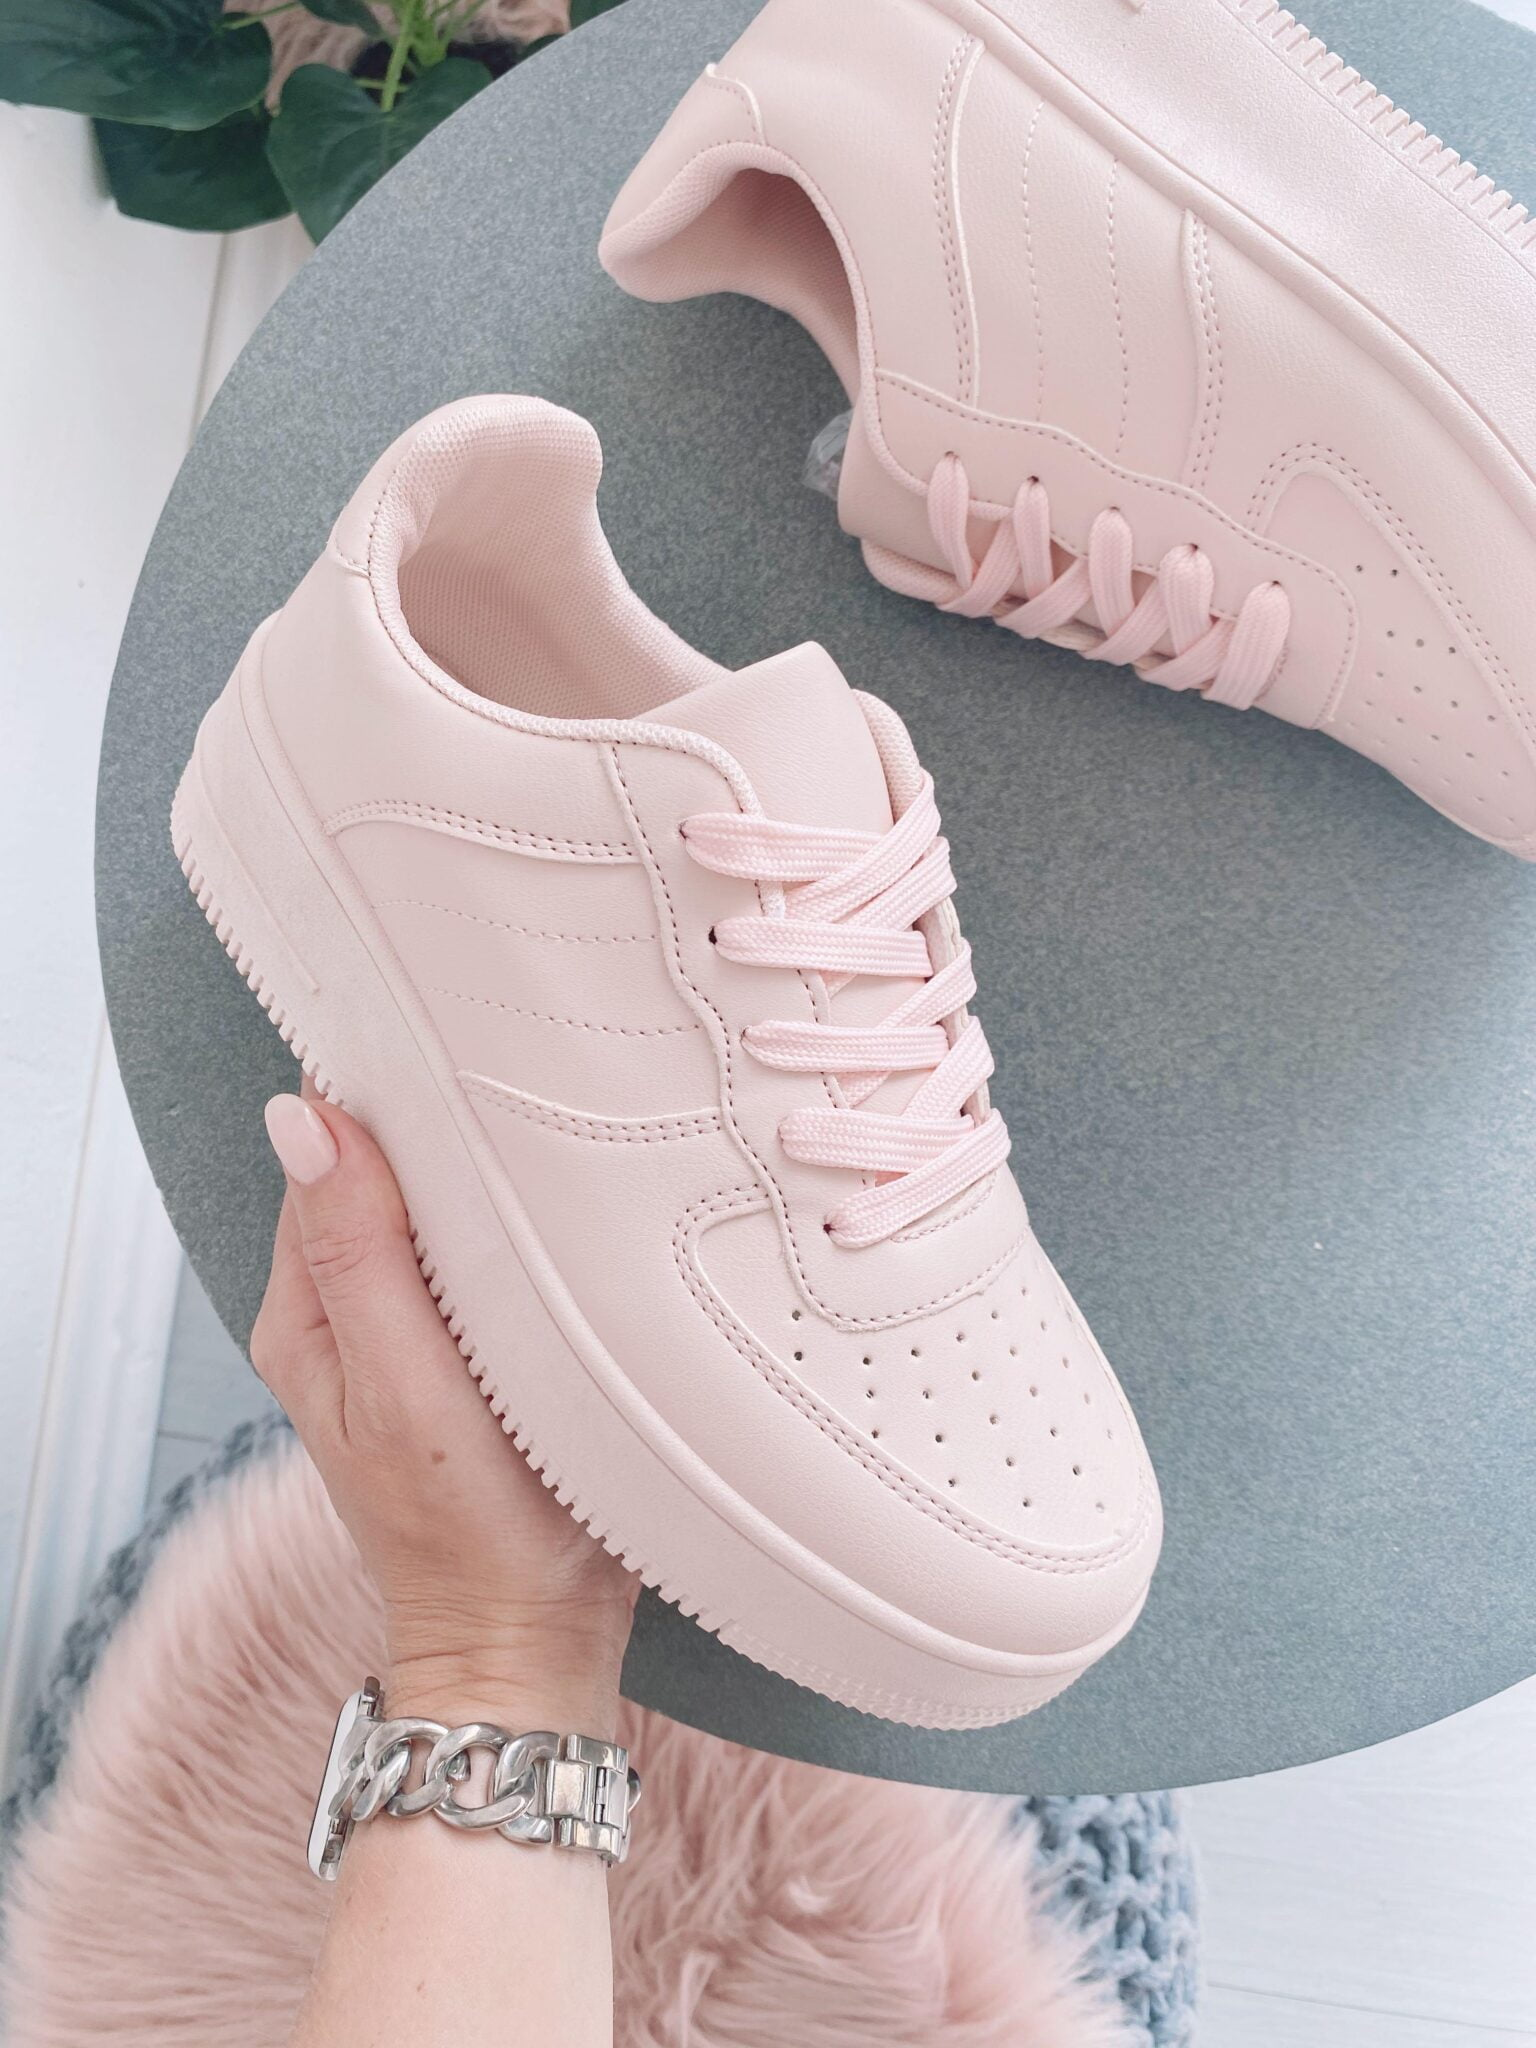 Superge 2002 pink